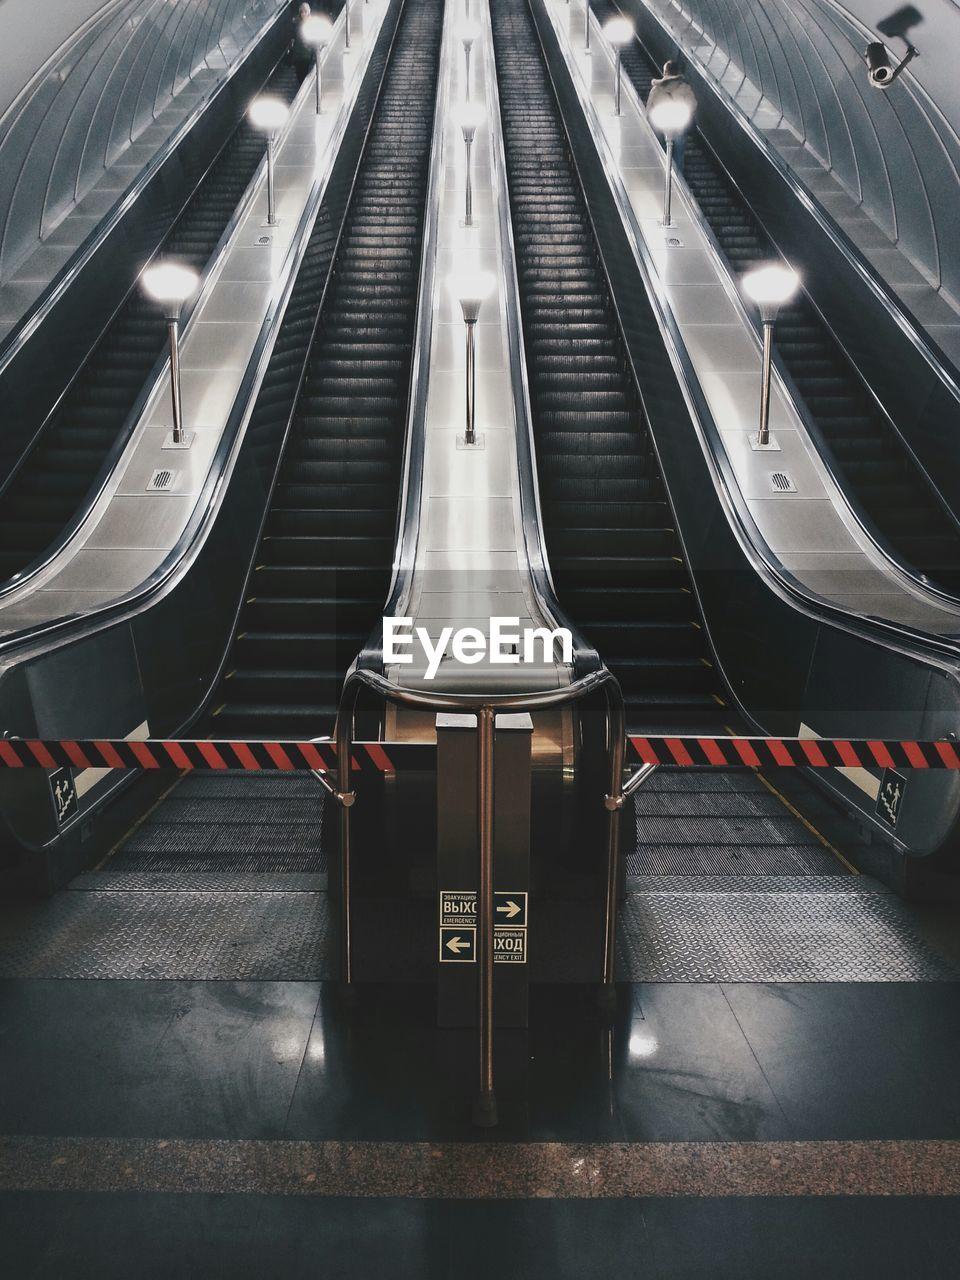 Symmetrical View Of Escalators In Underground Station